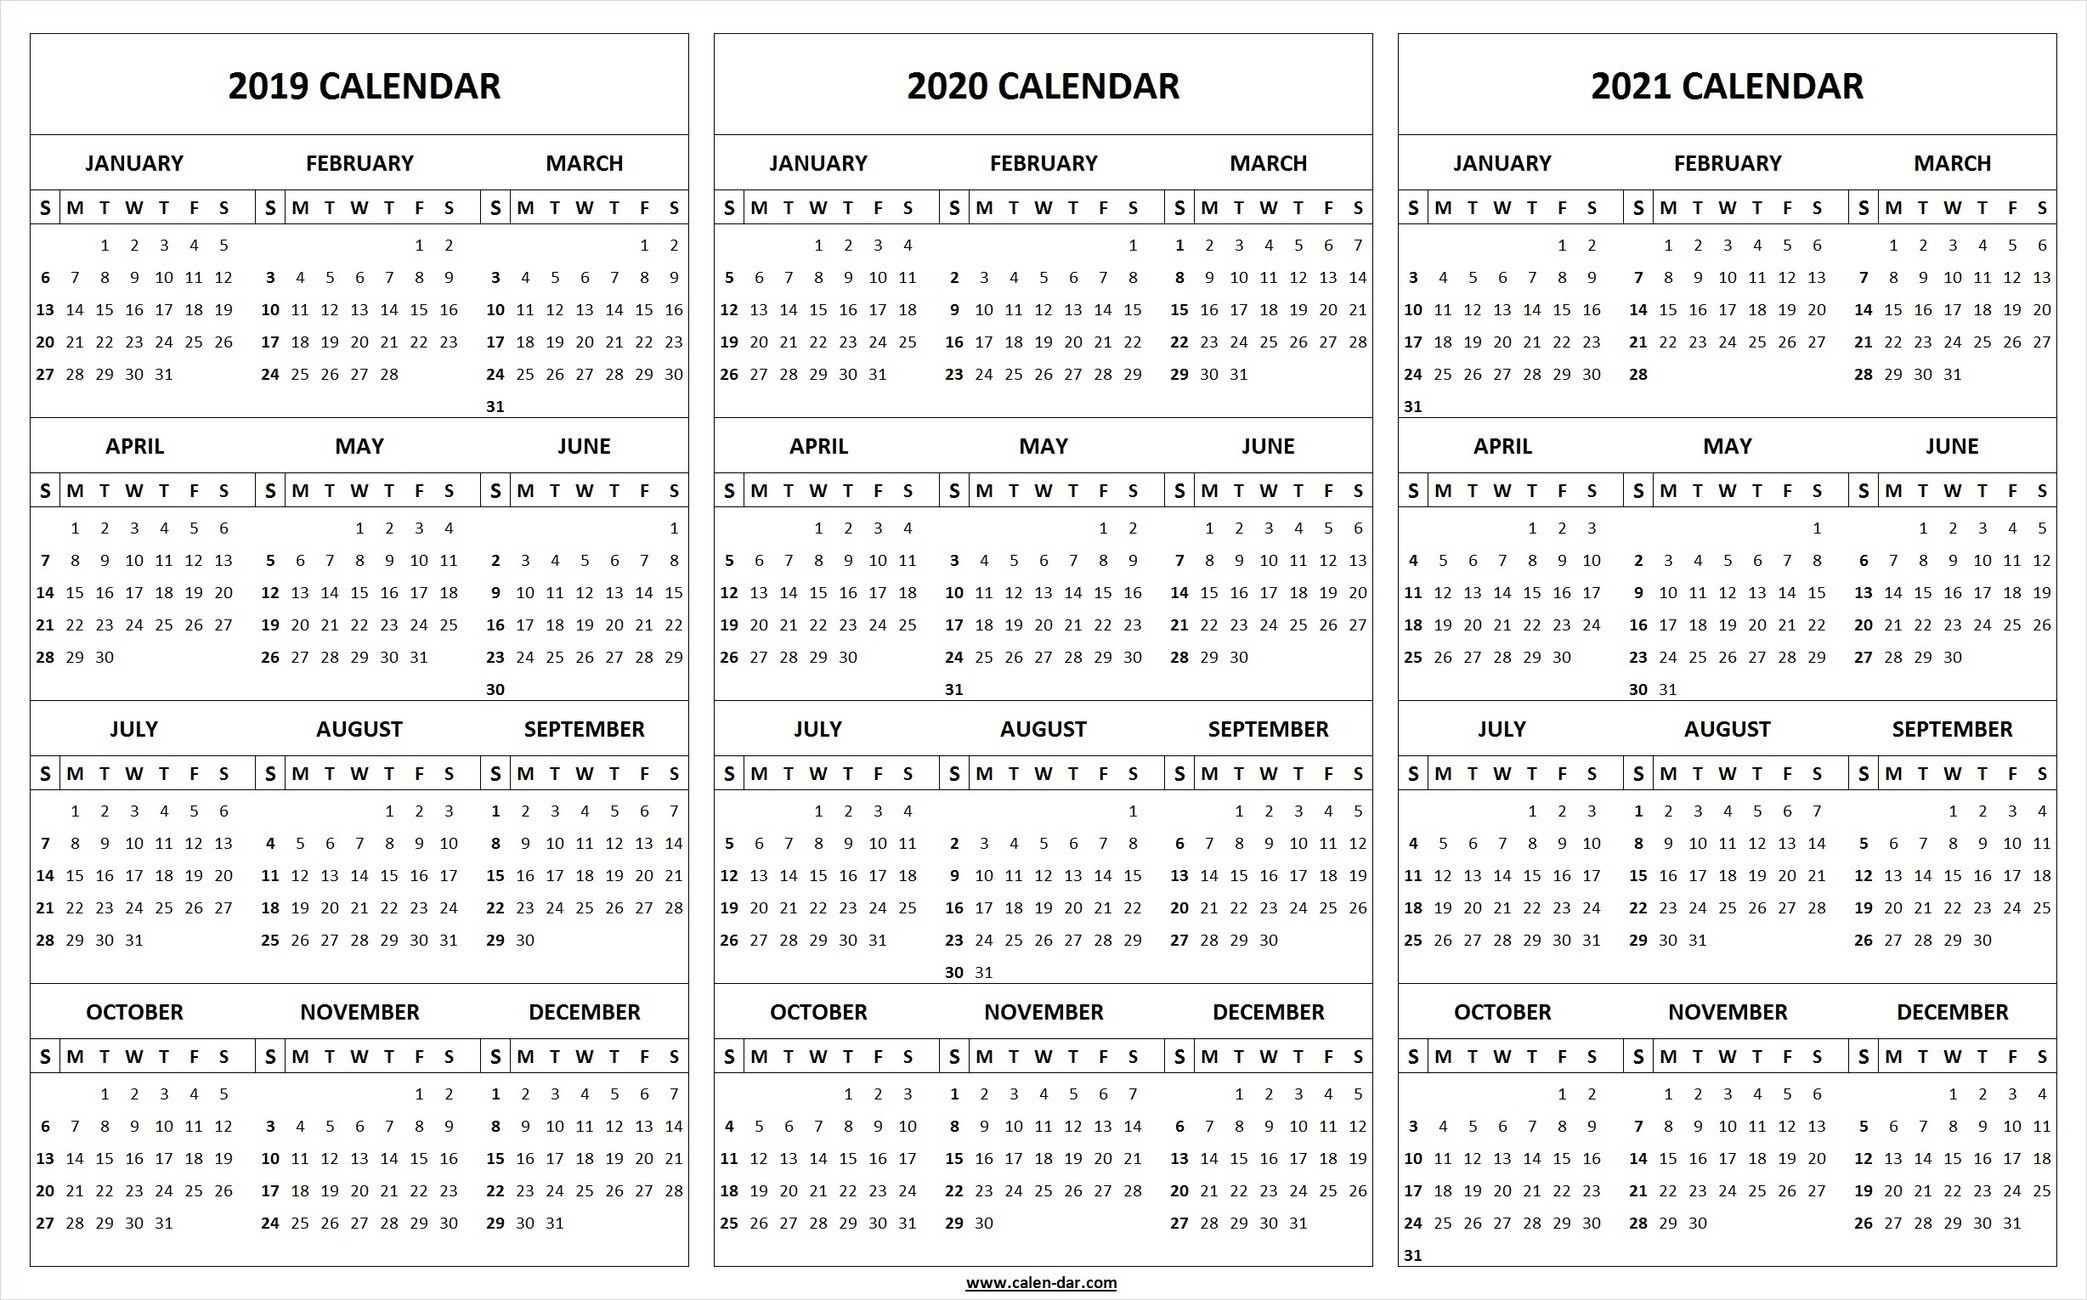 calendario 2019 chile para imprimir marzo recientes printable 2019 2020 2021 calendar template of calendario 2019 chile para imprimir marzo